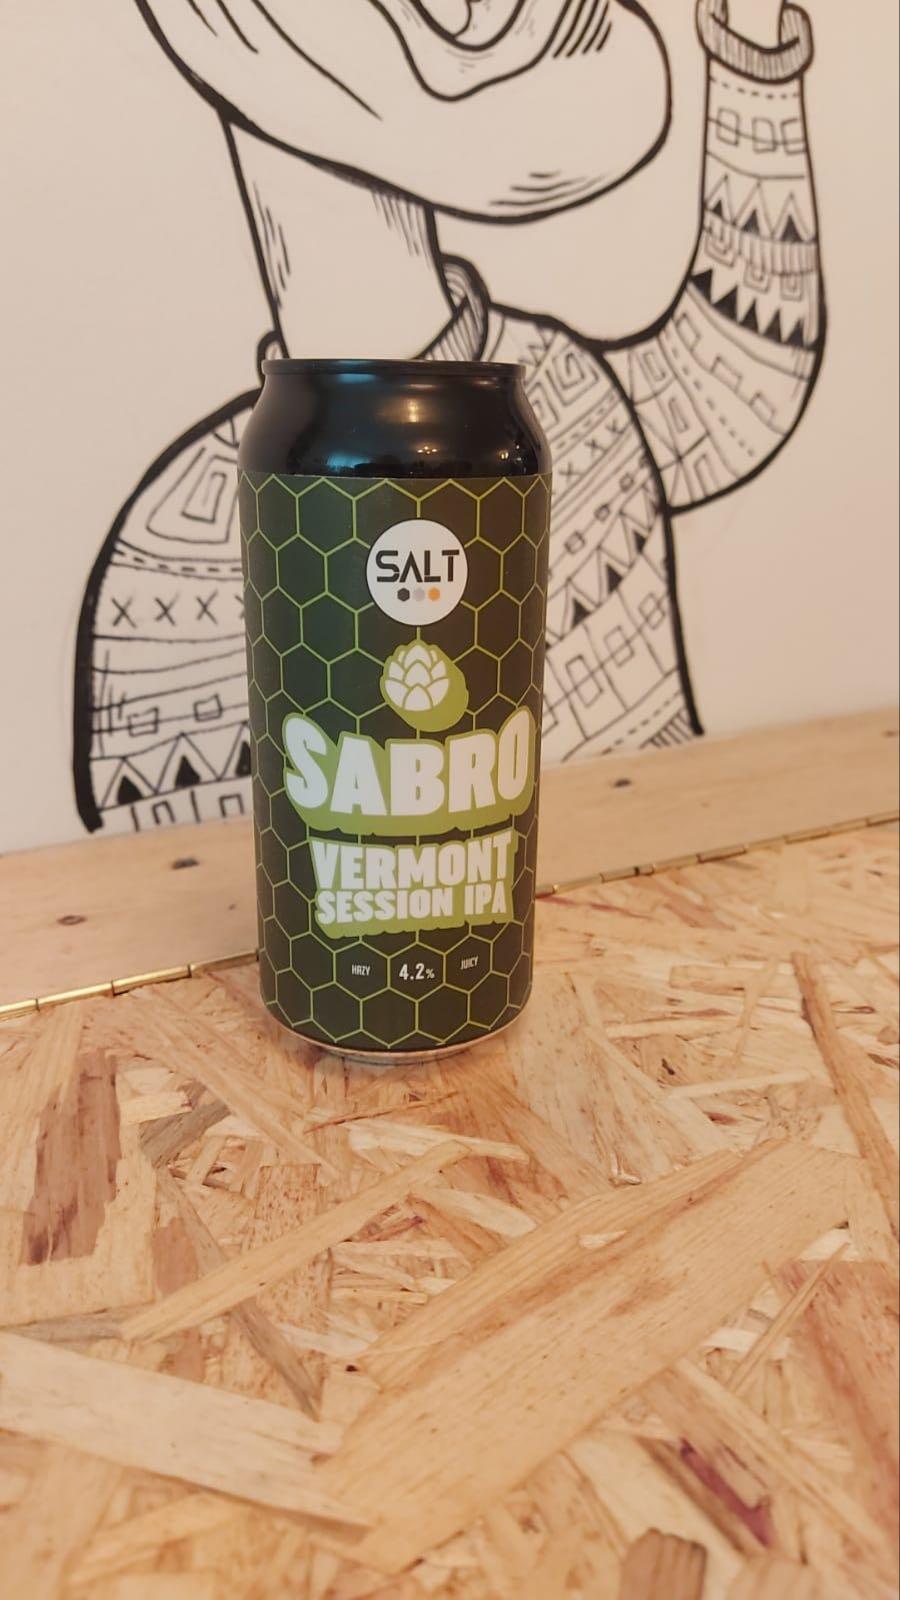 Salt Sabro Vermont Session IPA 4.2%